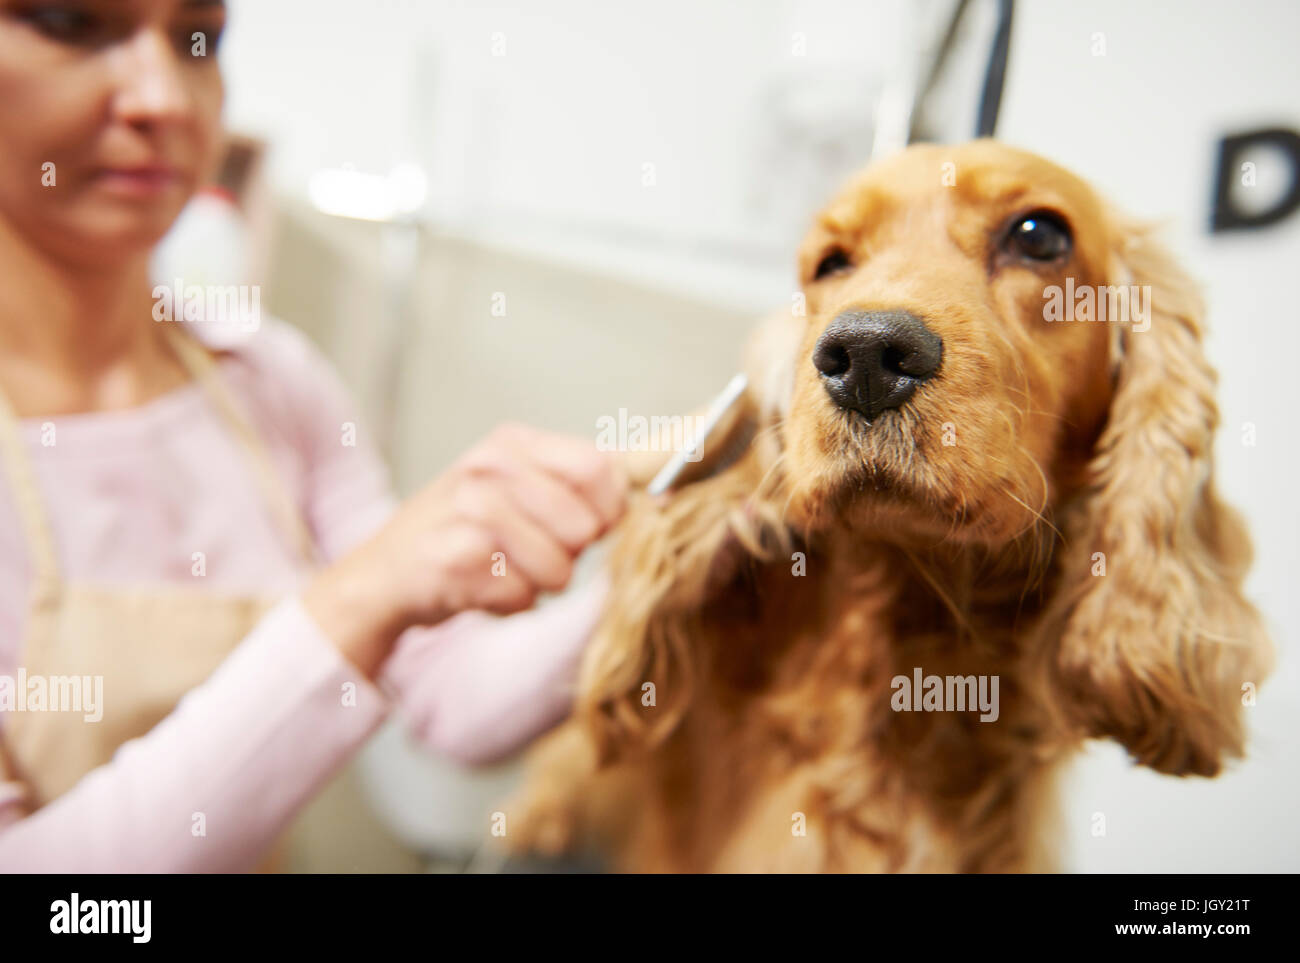 Female groomer brushing cocker spaniel at dog grooming salon - Stock Image